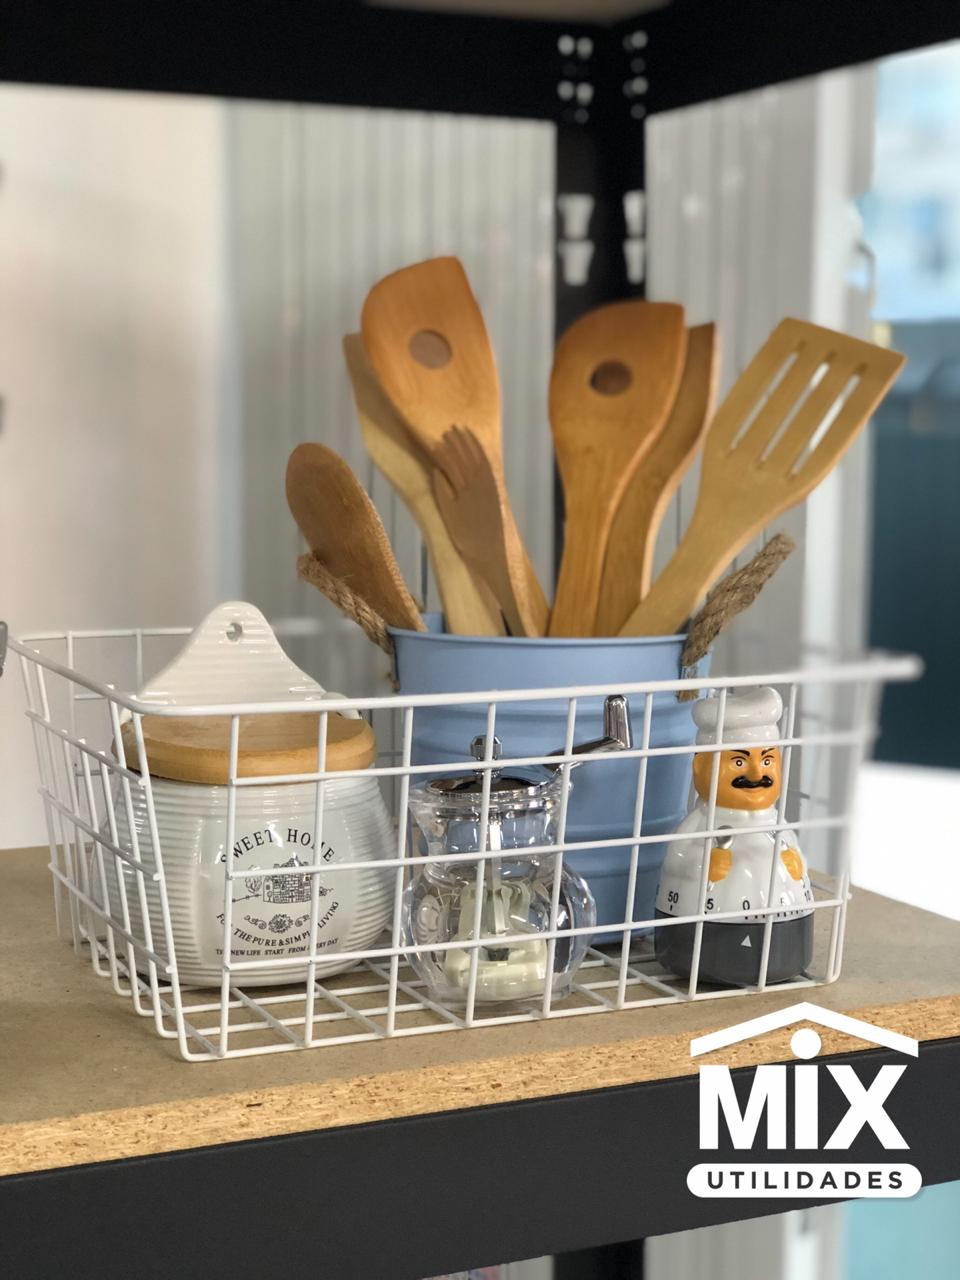 Mix Utilidade